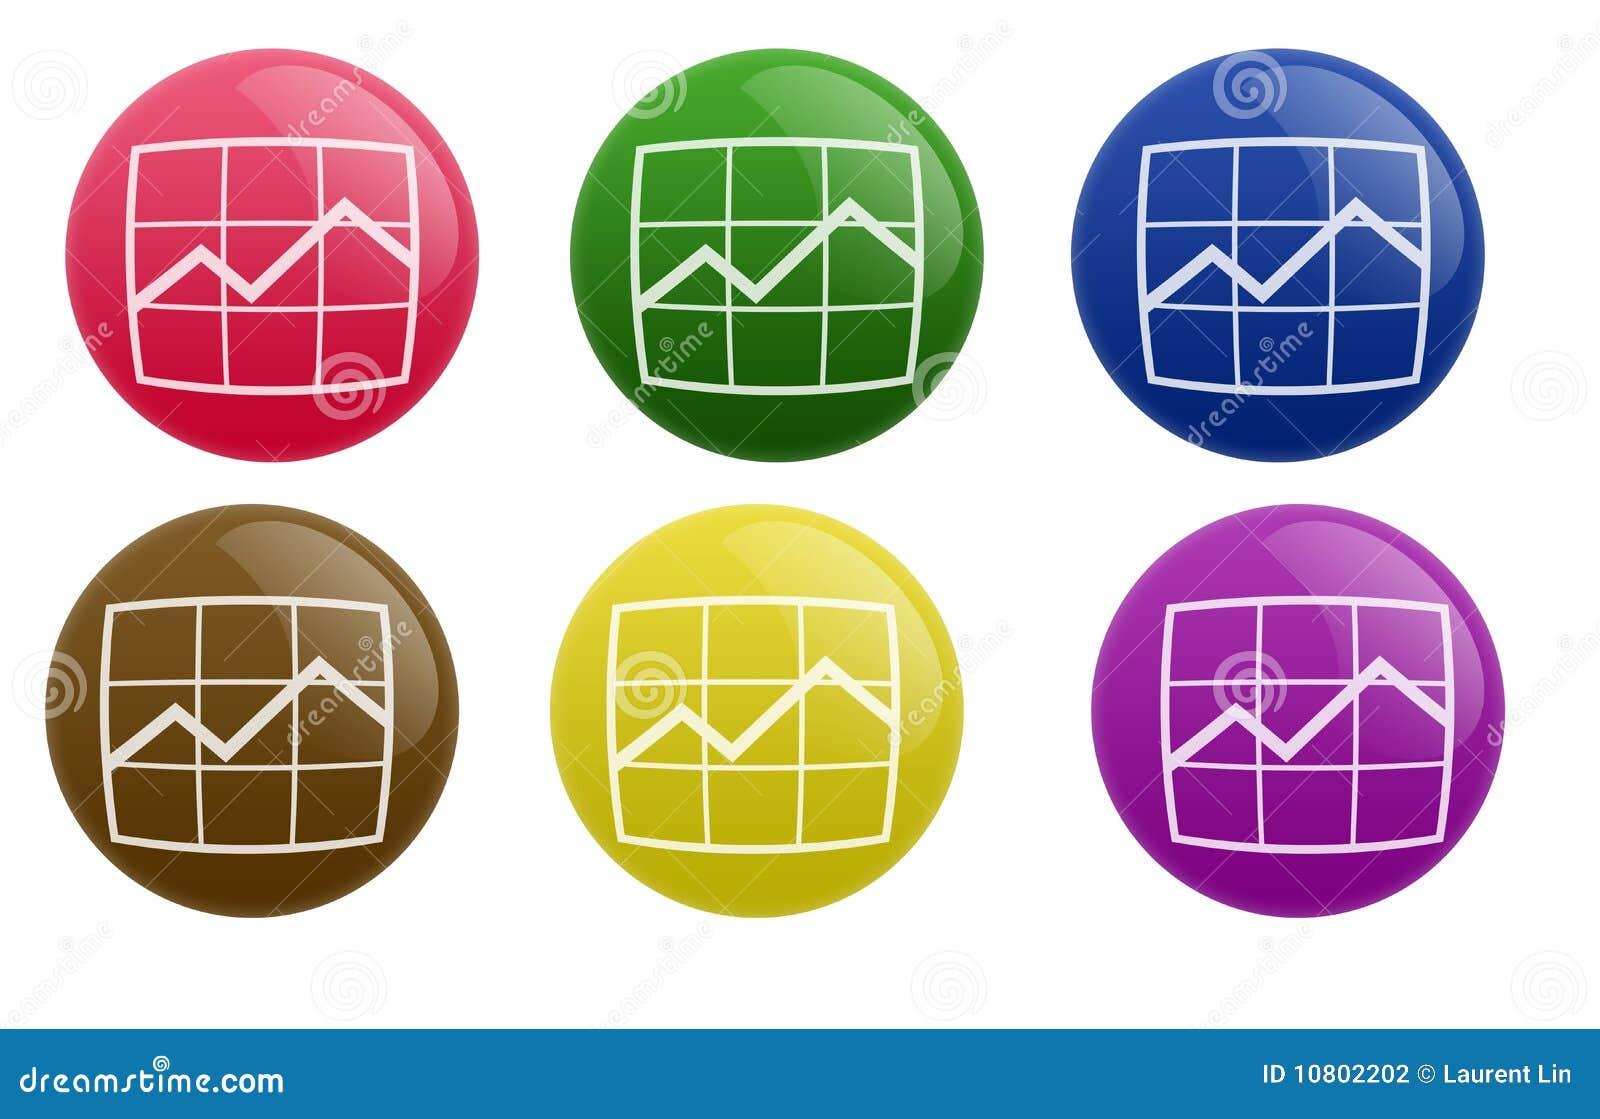 Download Glossy Progress Button stock illustration. Illustration of generated - 10802202